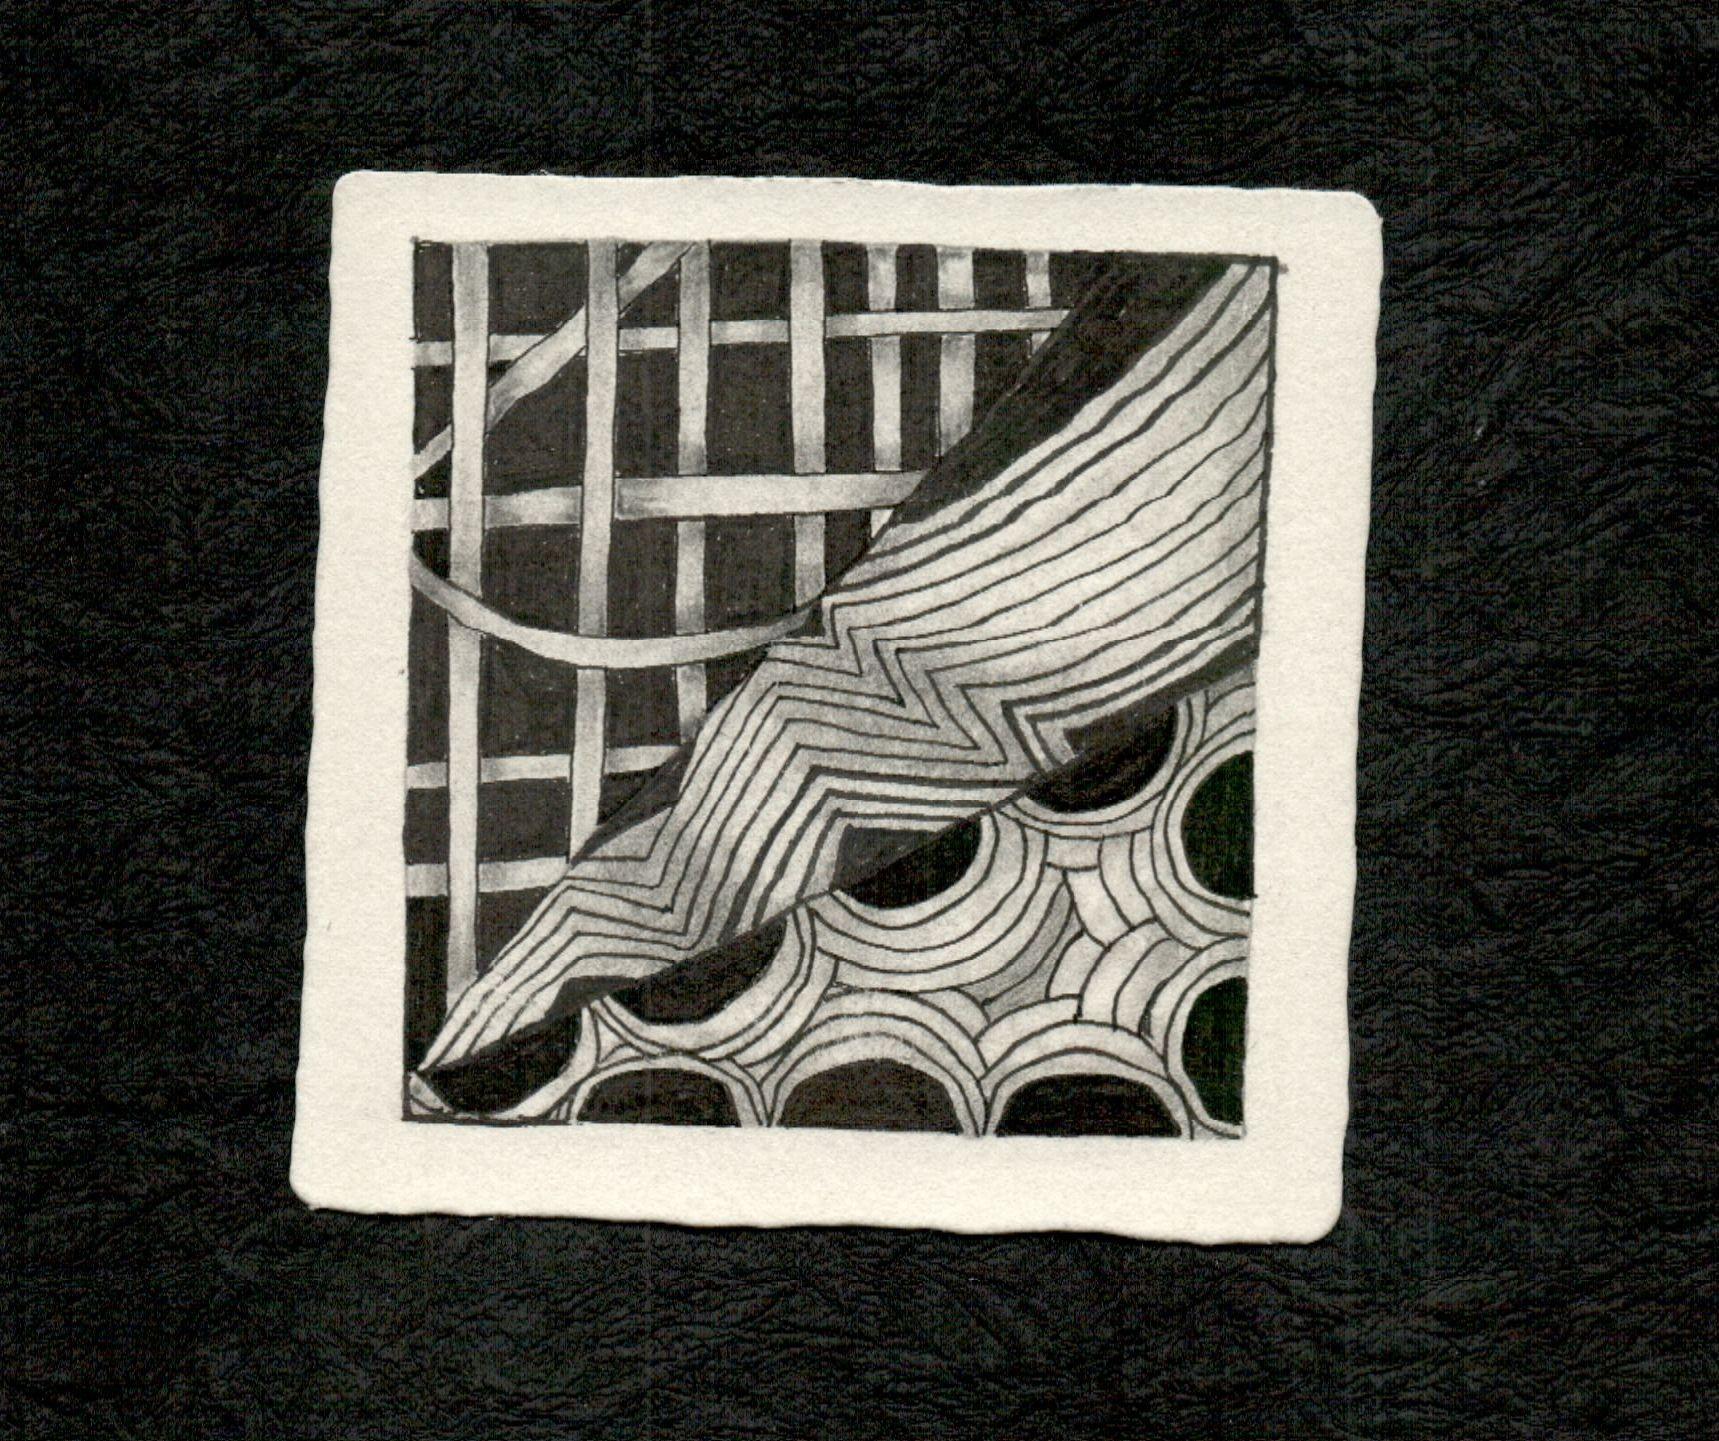 My First Zentangle on an official zentangle art card by Tina Grace